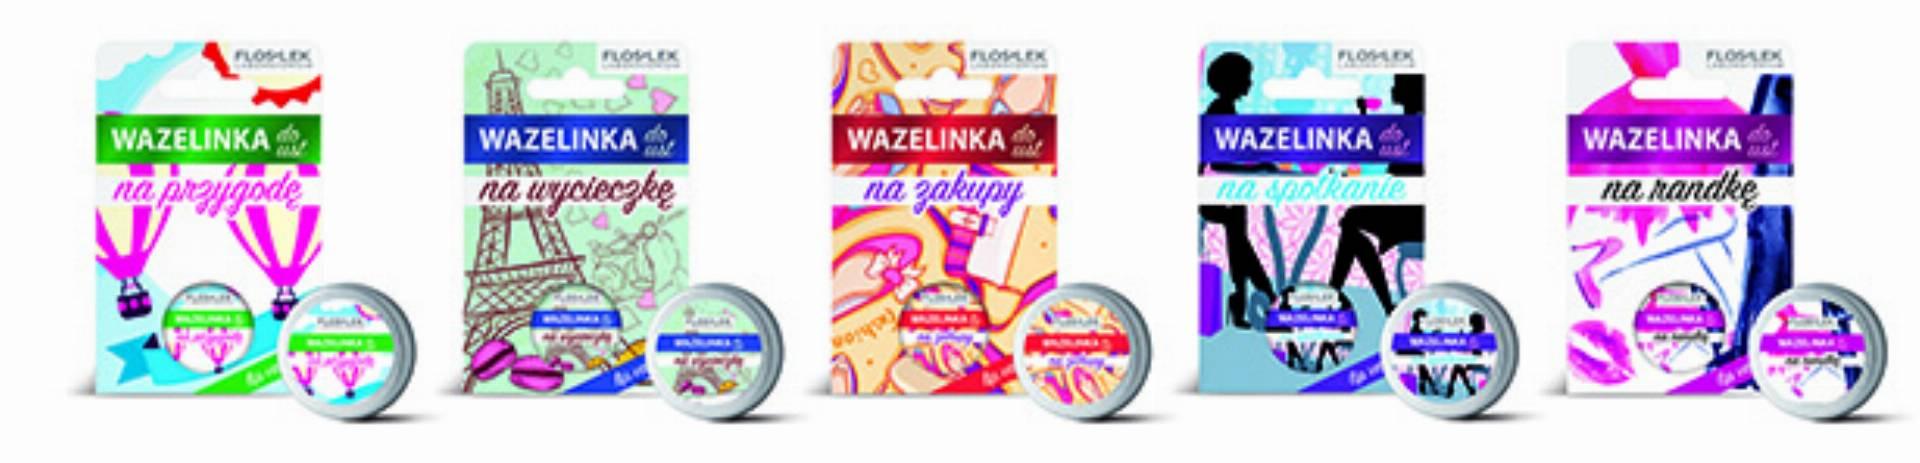 wazeliny_komp-small